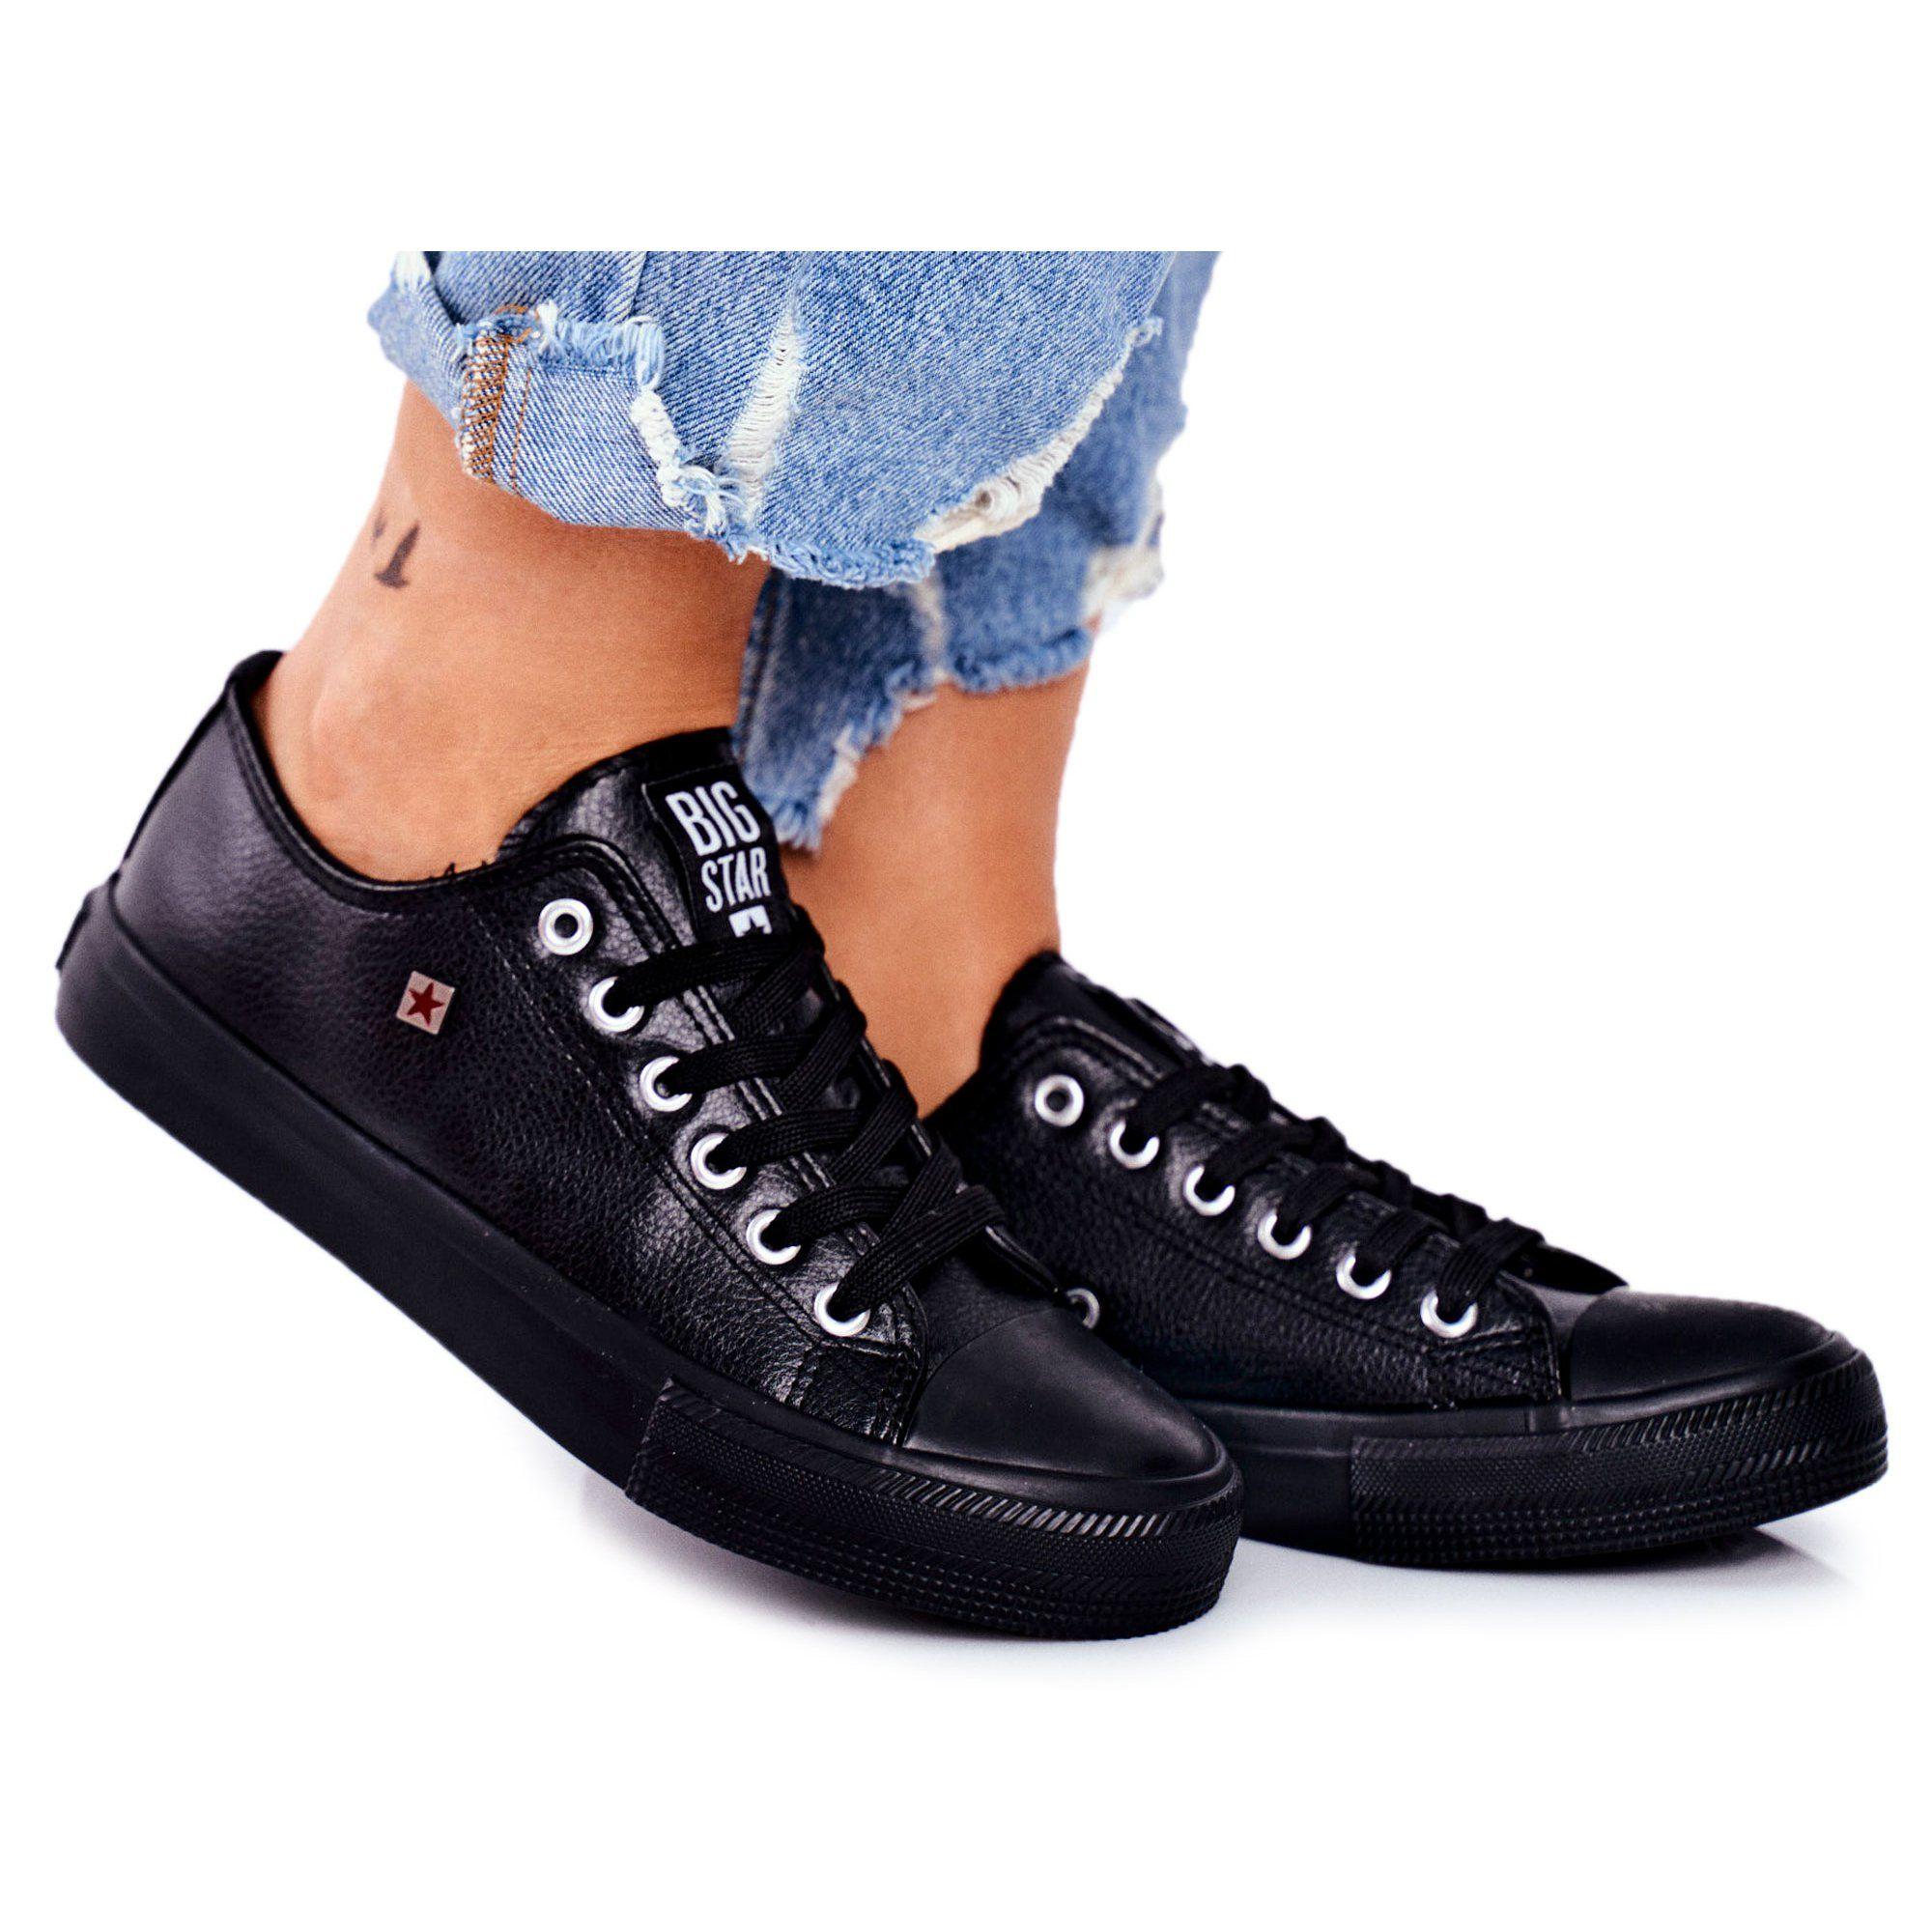 Big Star Damskie Ocieplane Szare Trampki Tenisowki Monokolor Bb274062 Bugo Pl Buty Damskie Sneakers Sperry Sneaker Tretorn Sneaker